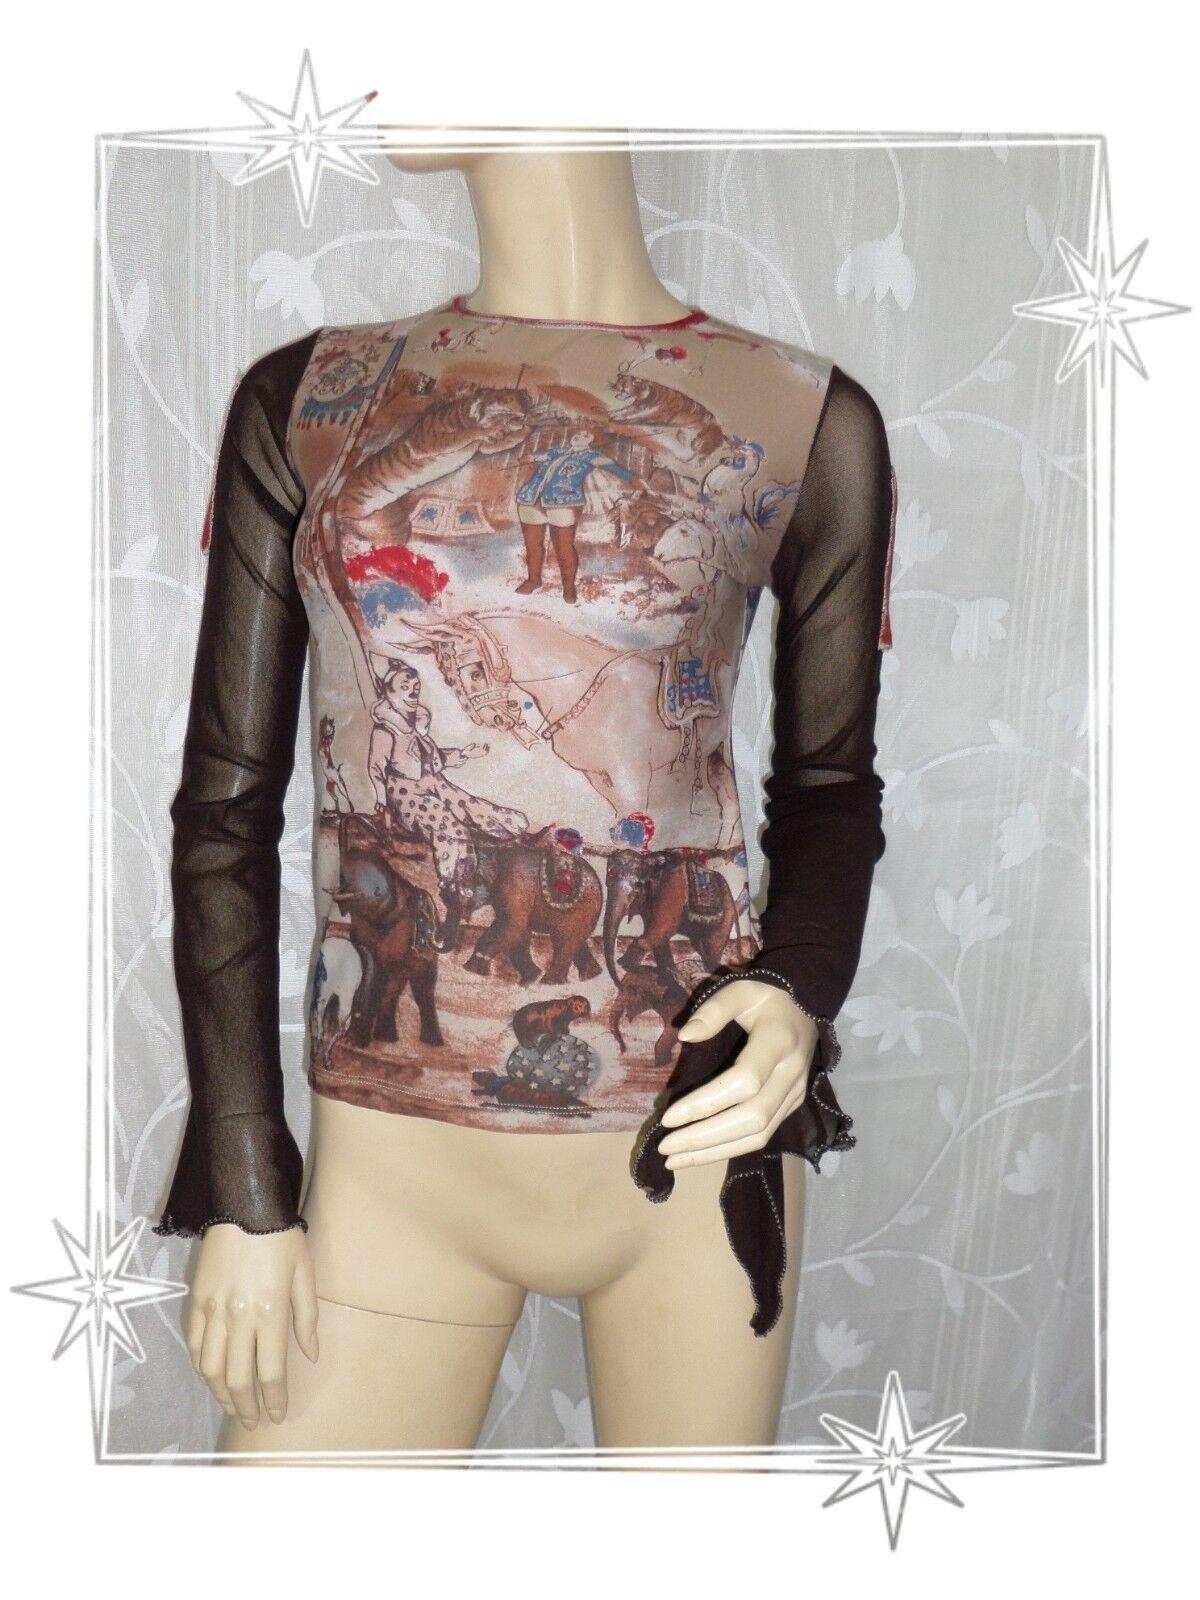 B -  Haut T-shirt  Fantaisie Bi Matière  brown Cirque  Save The Queen size M